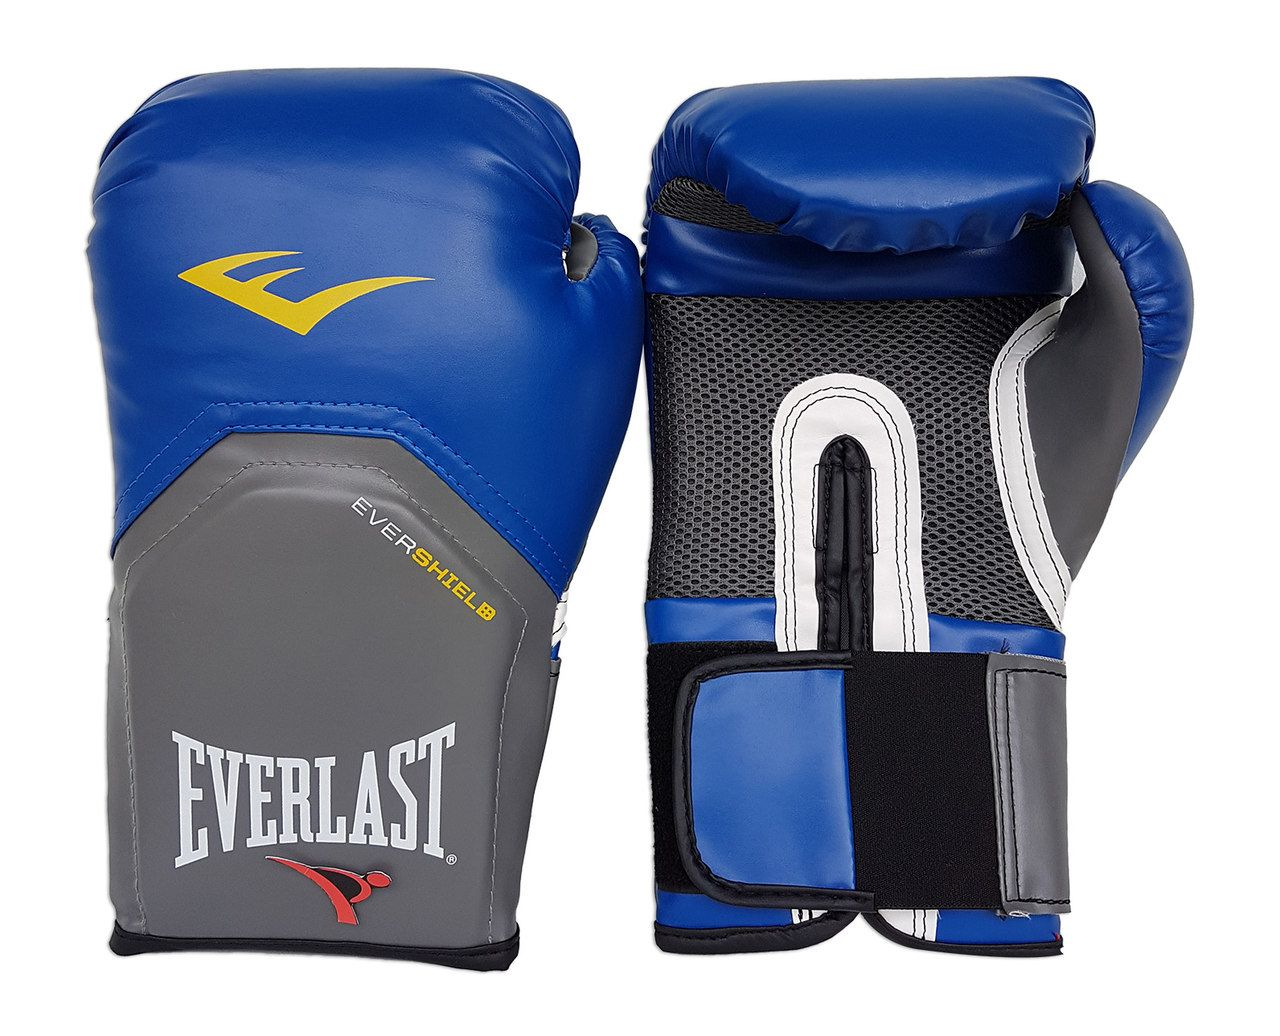 Luva de Boxe / Muay Thai 14oz - Azul - Pro Style - Everlast  - PRALUTA SHOP